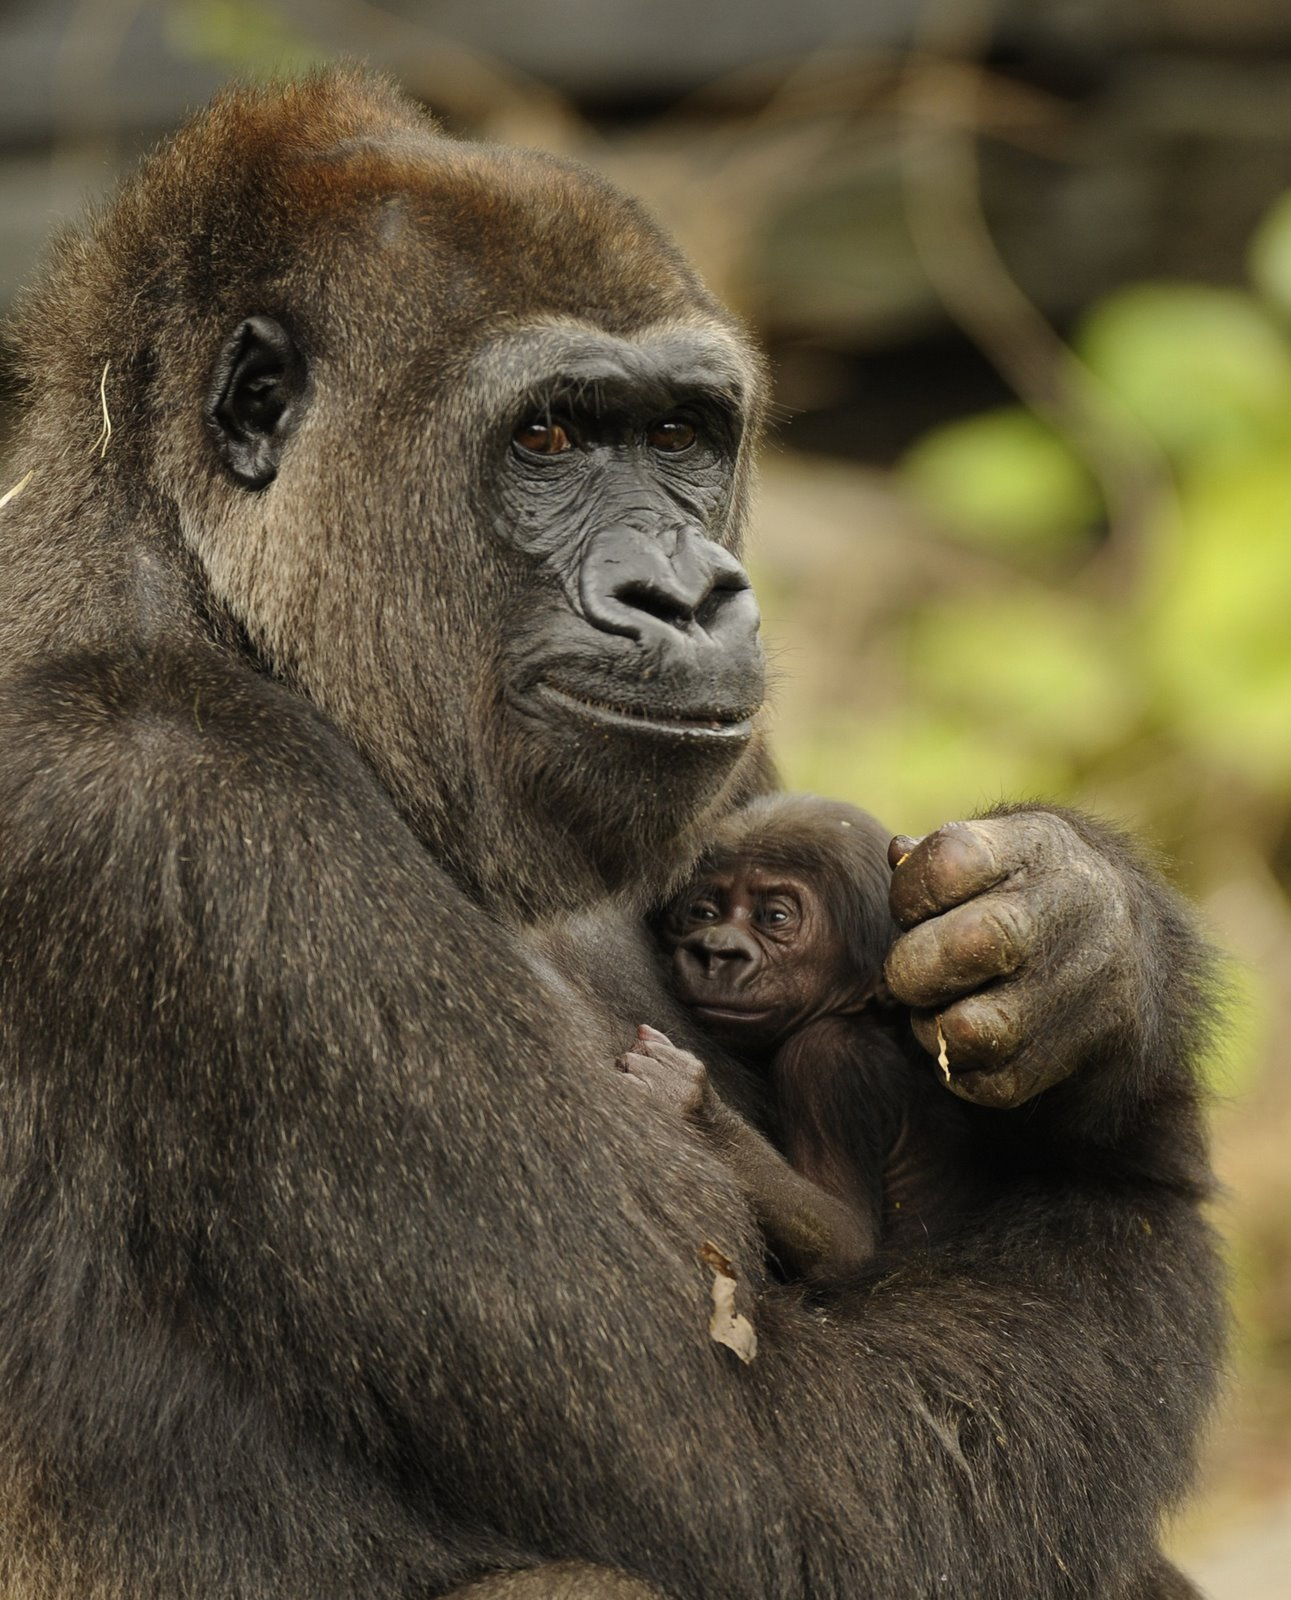 mother_and_baby_gorilla_022410_jpg_54132_orig